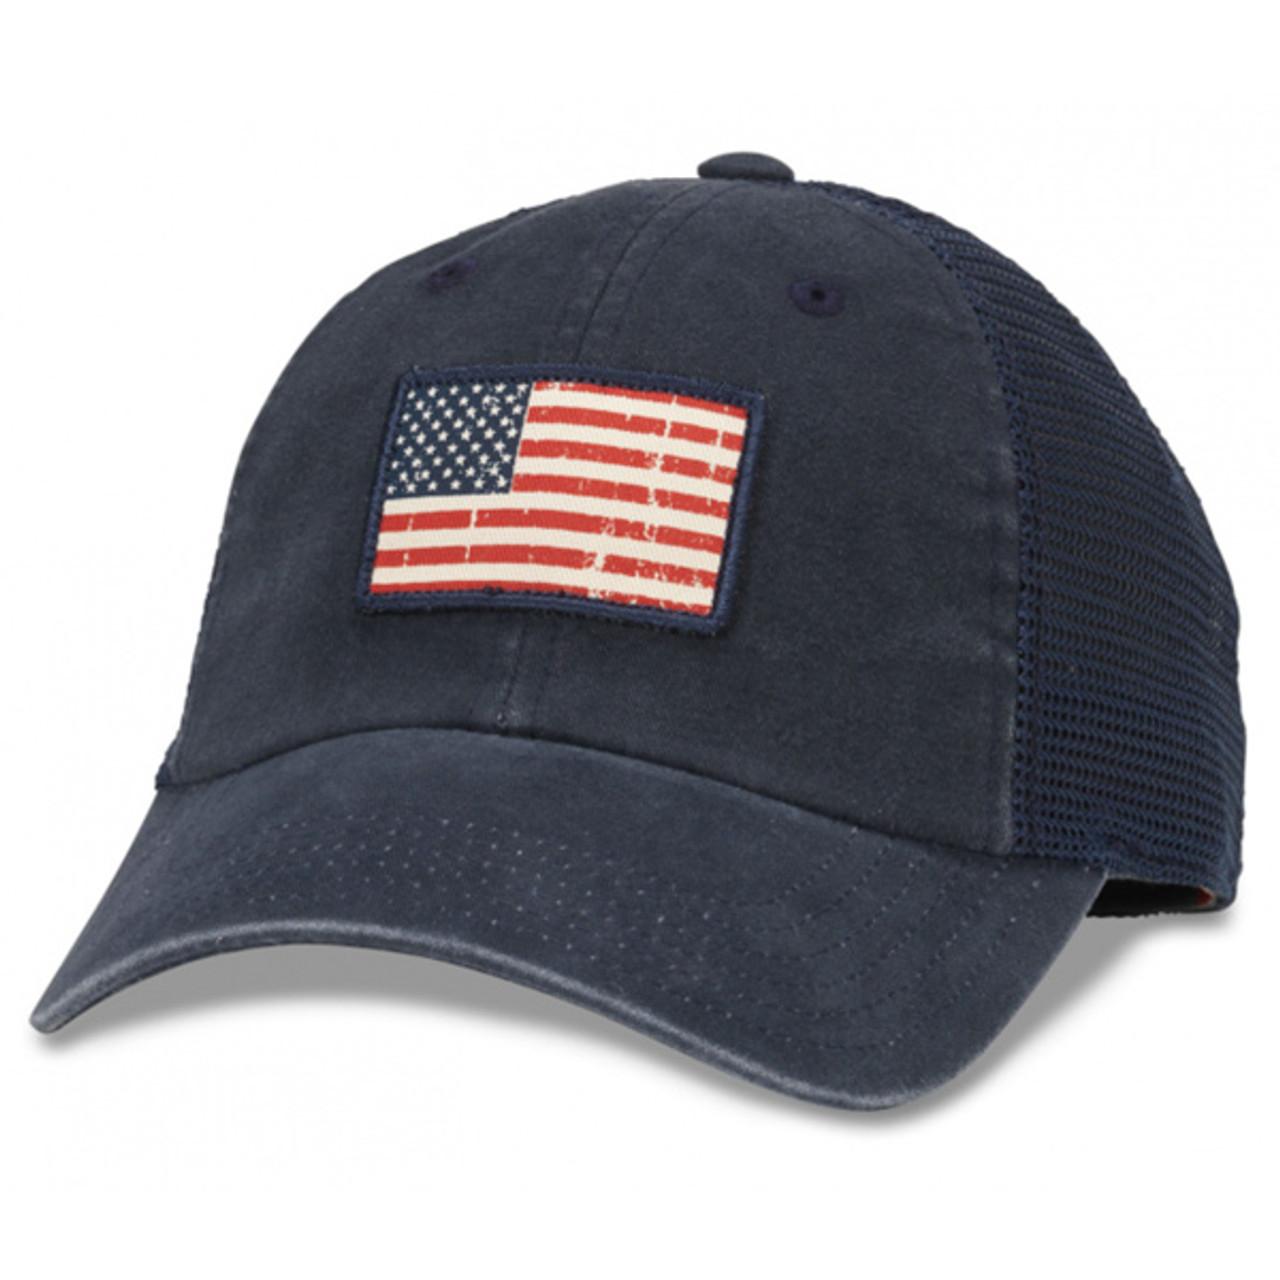 NEW BIG USA FLAG BALL CAP HAT BLACK